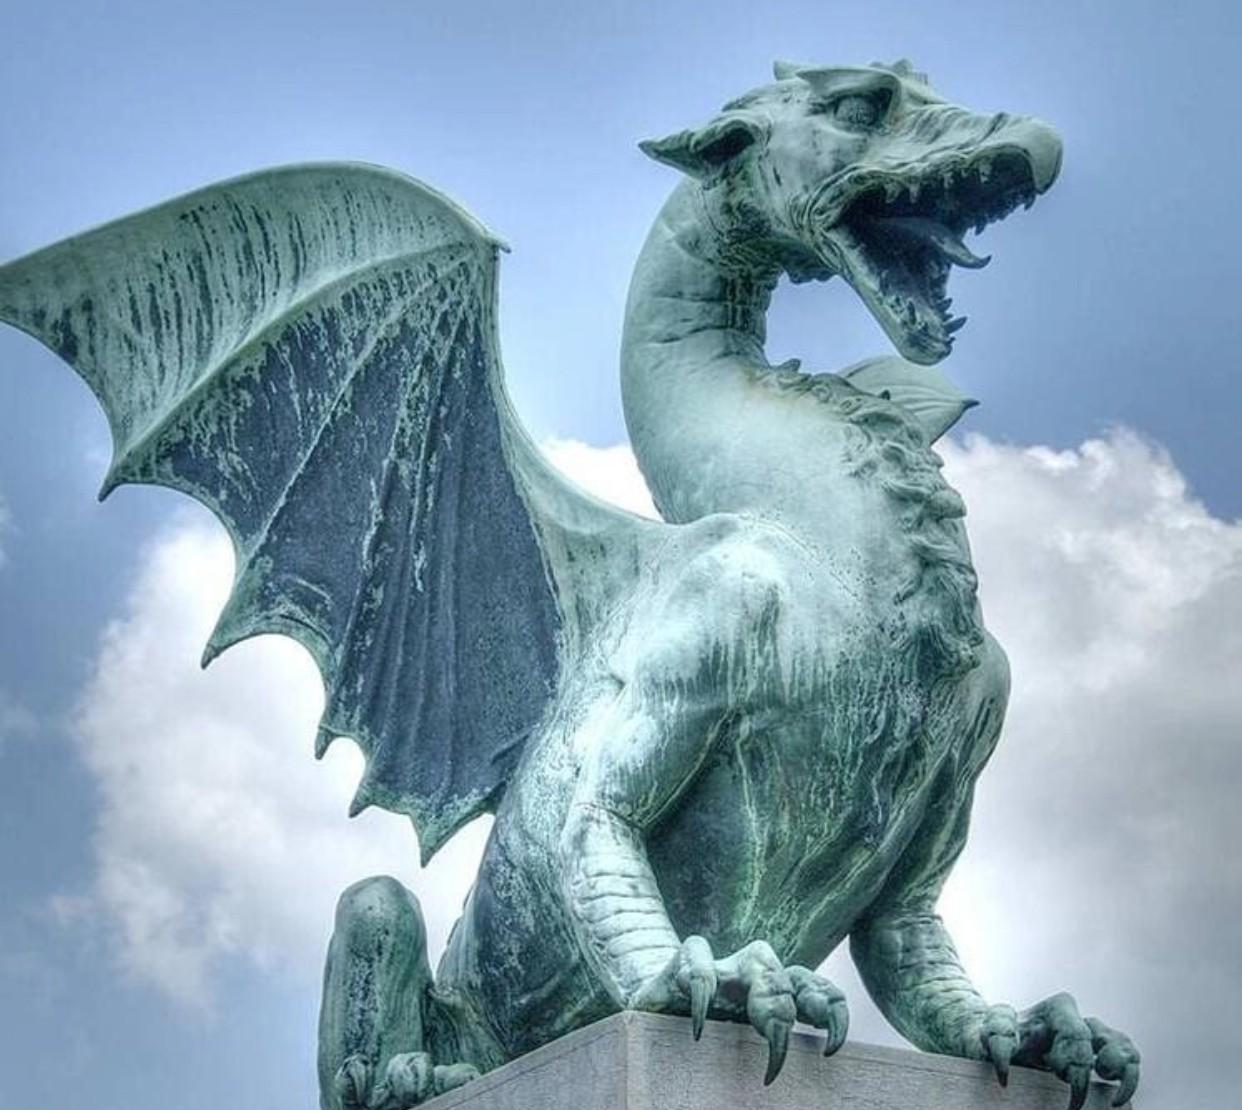 Garden dragon statues